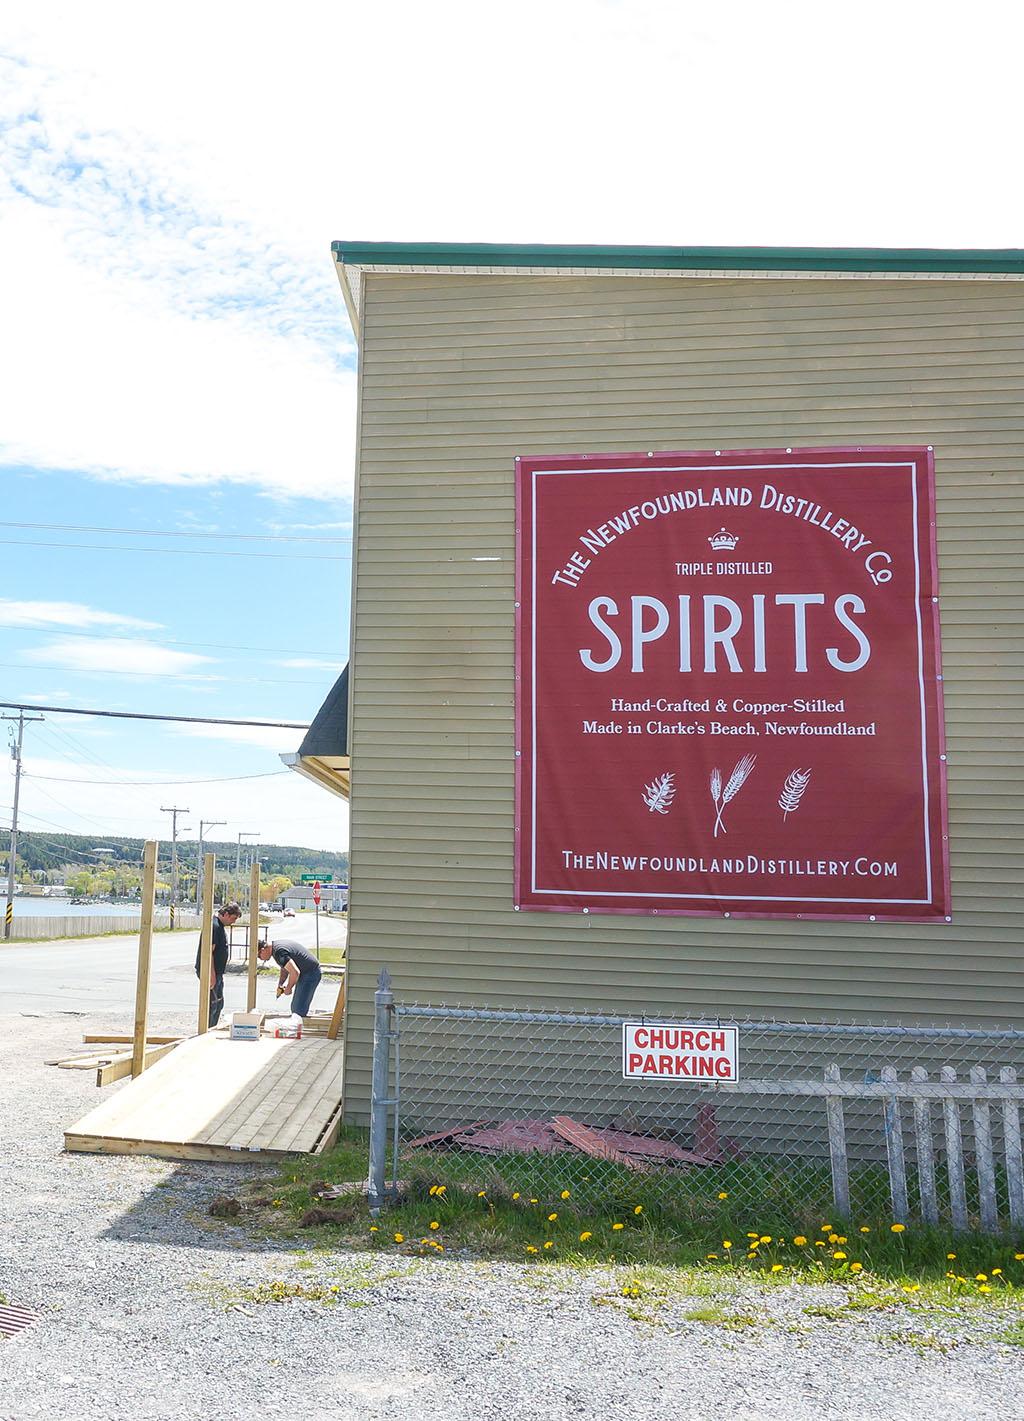 The Newfoundland Distillery